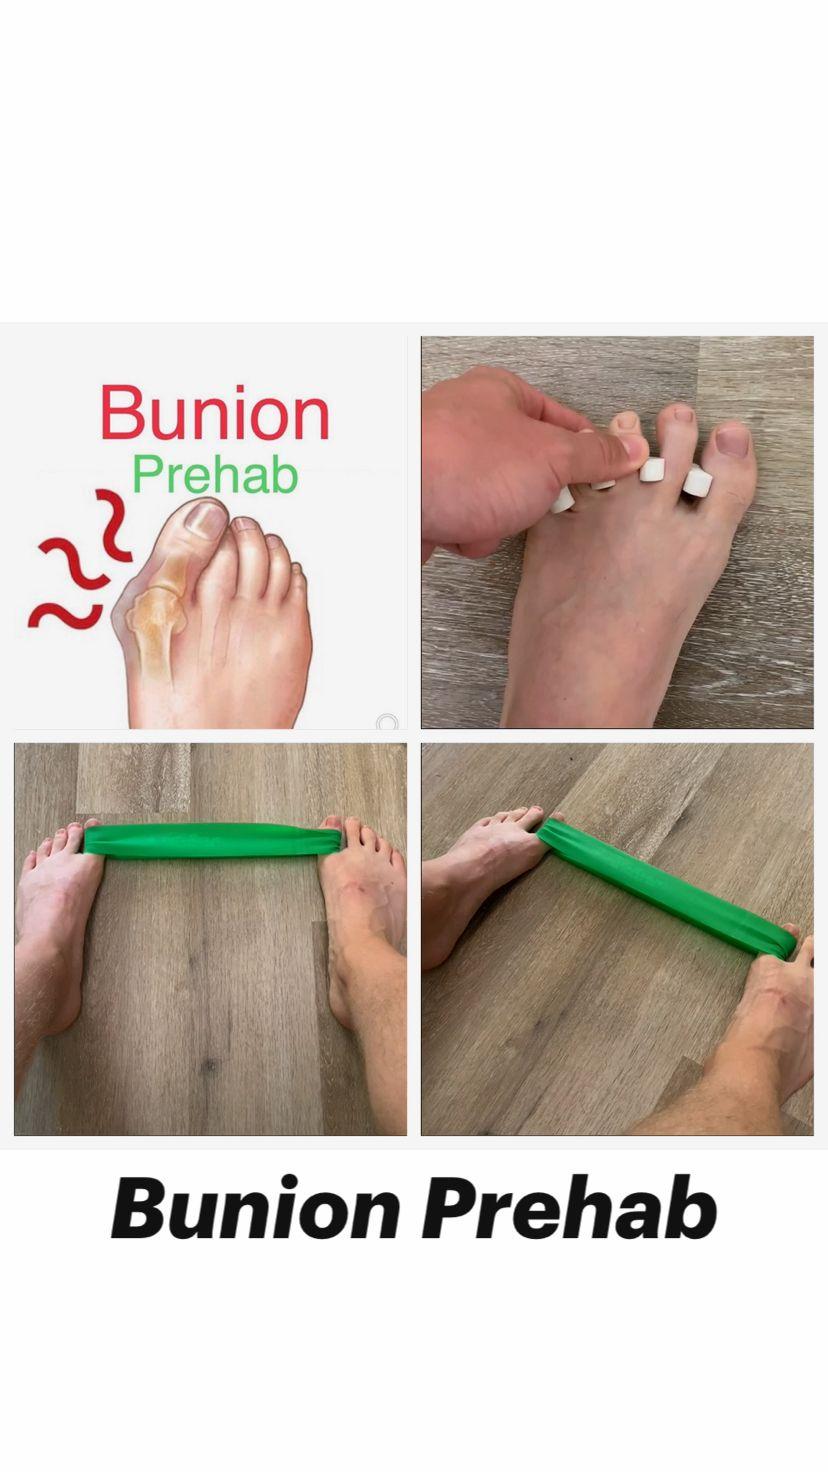 Bunion Prehab